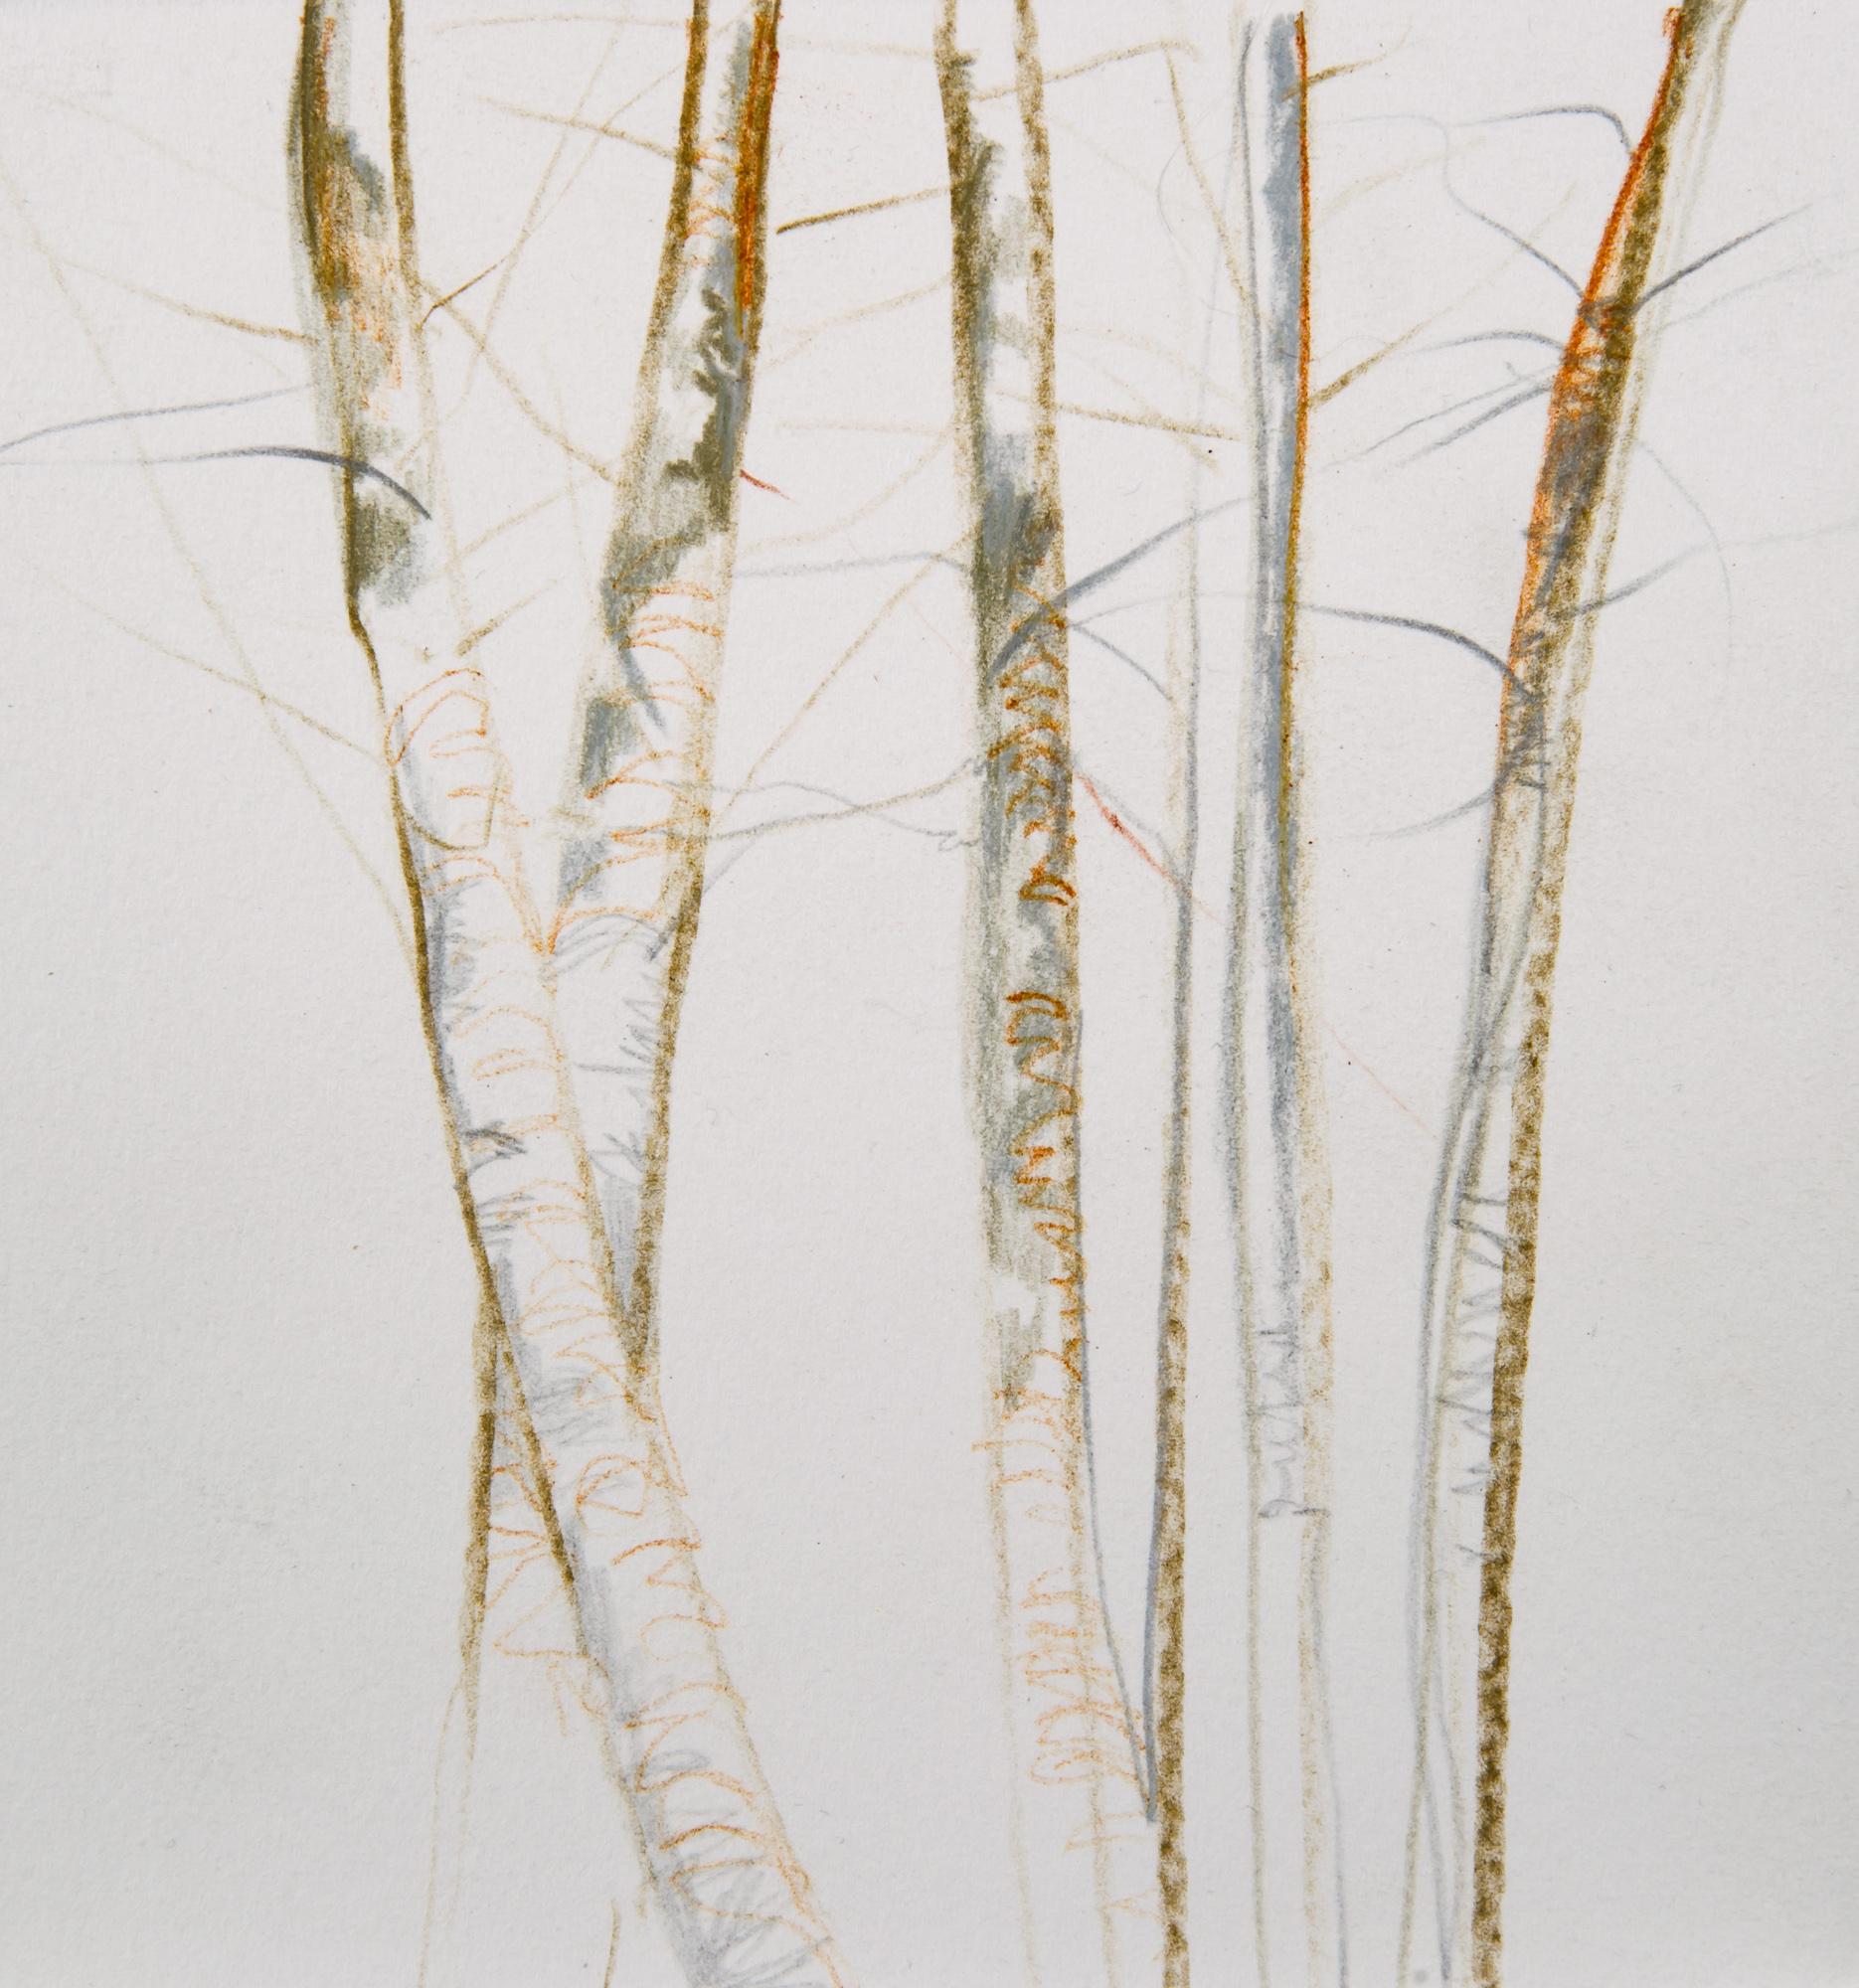 Tree Study 3 | 6x6